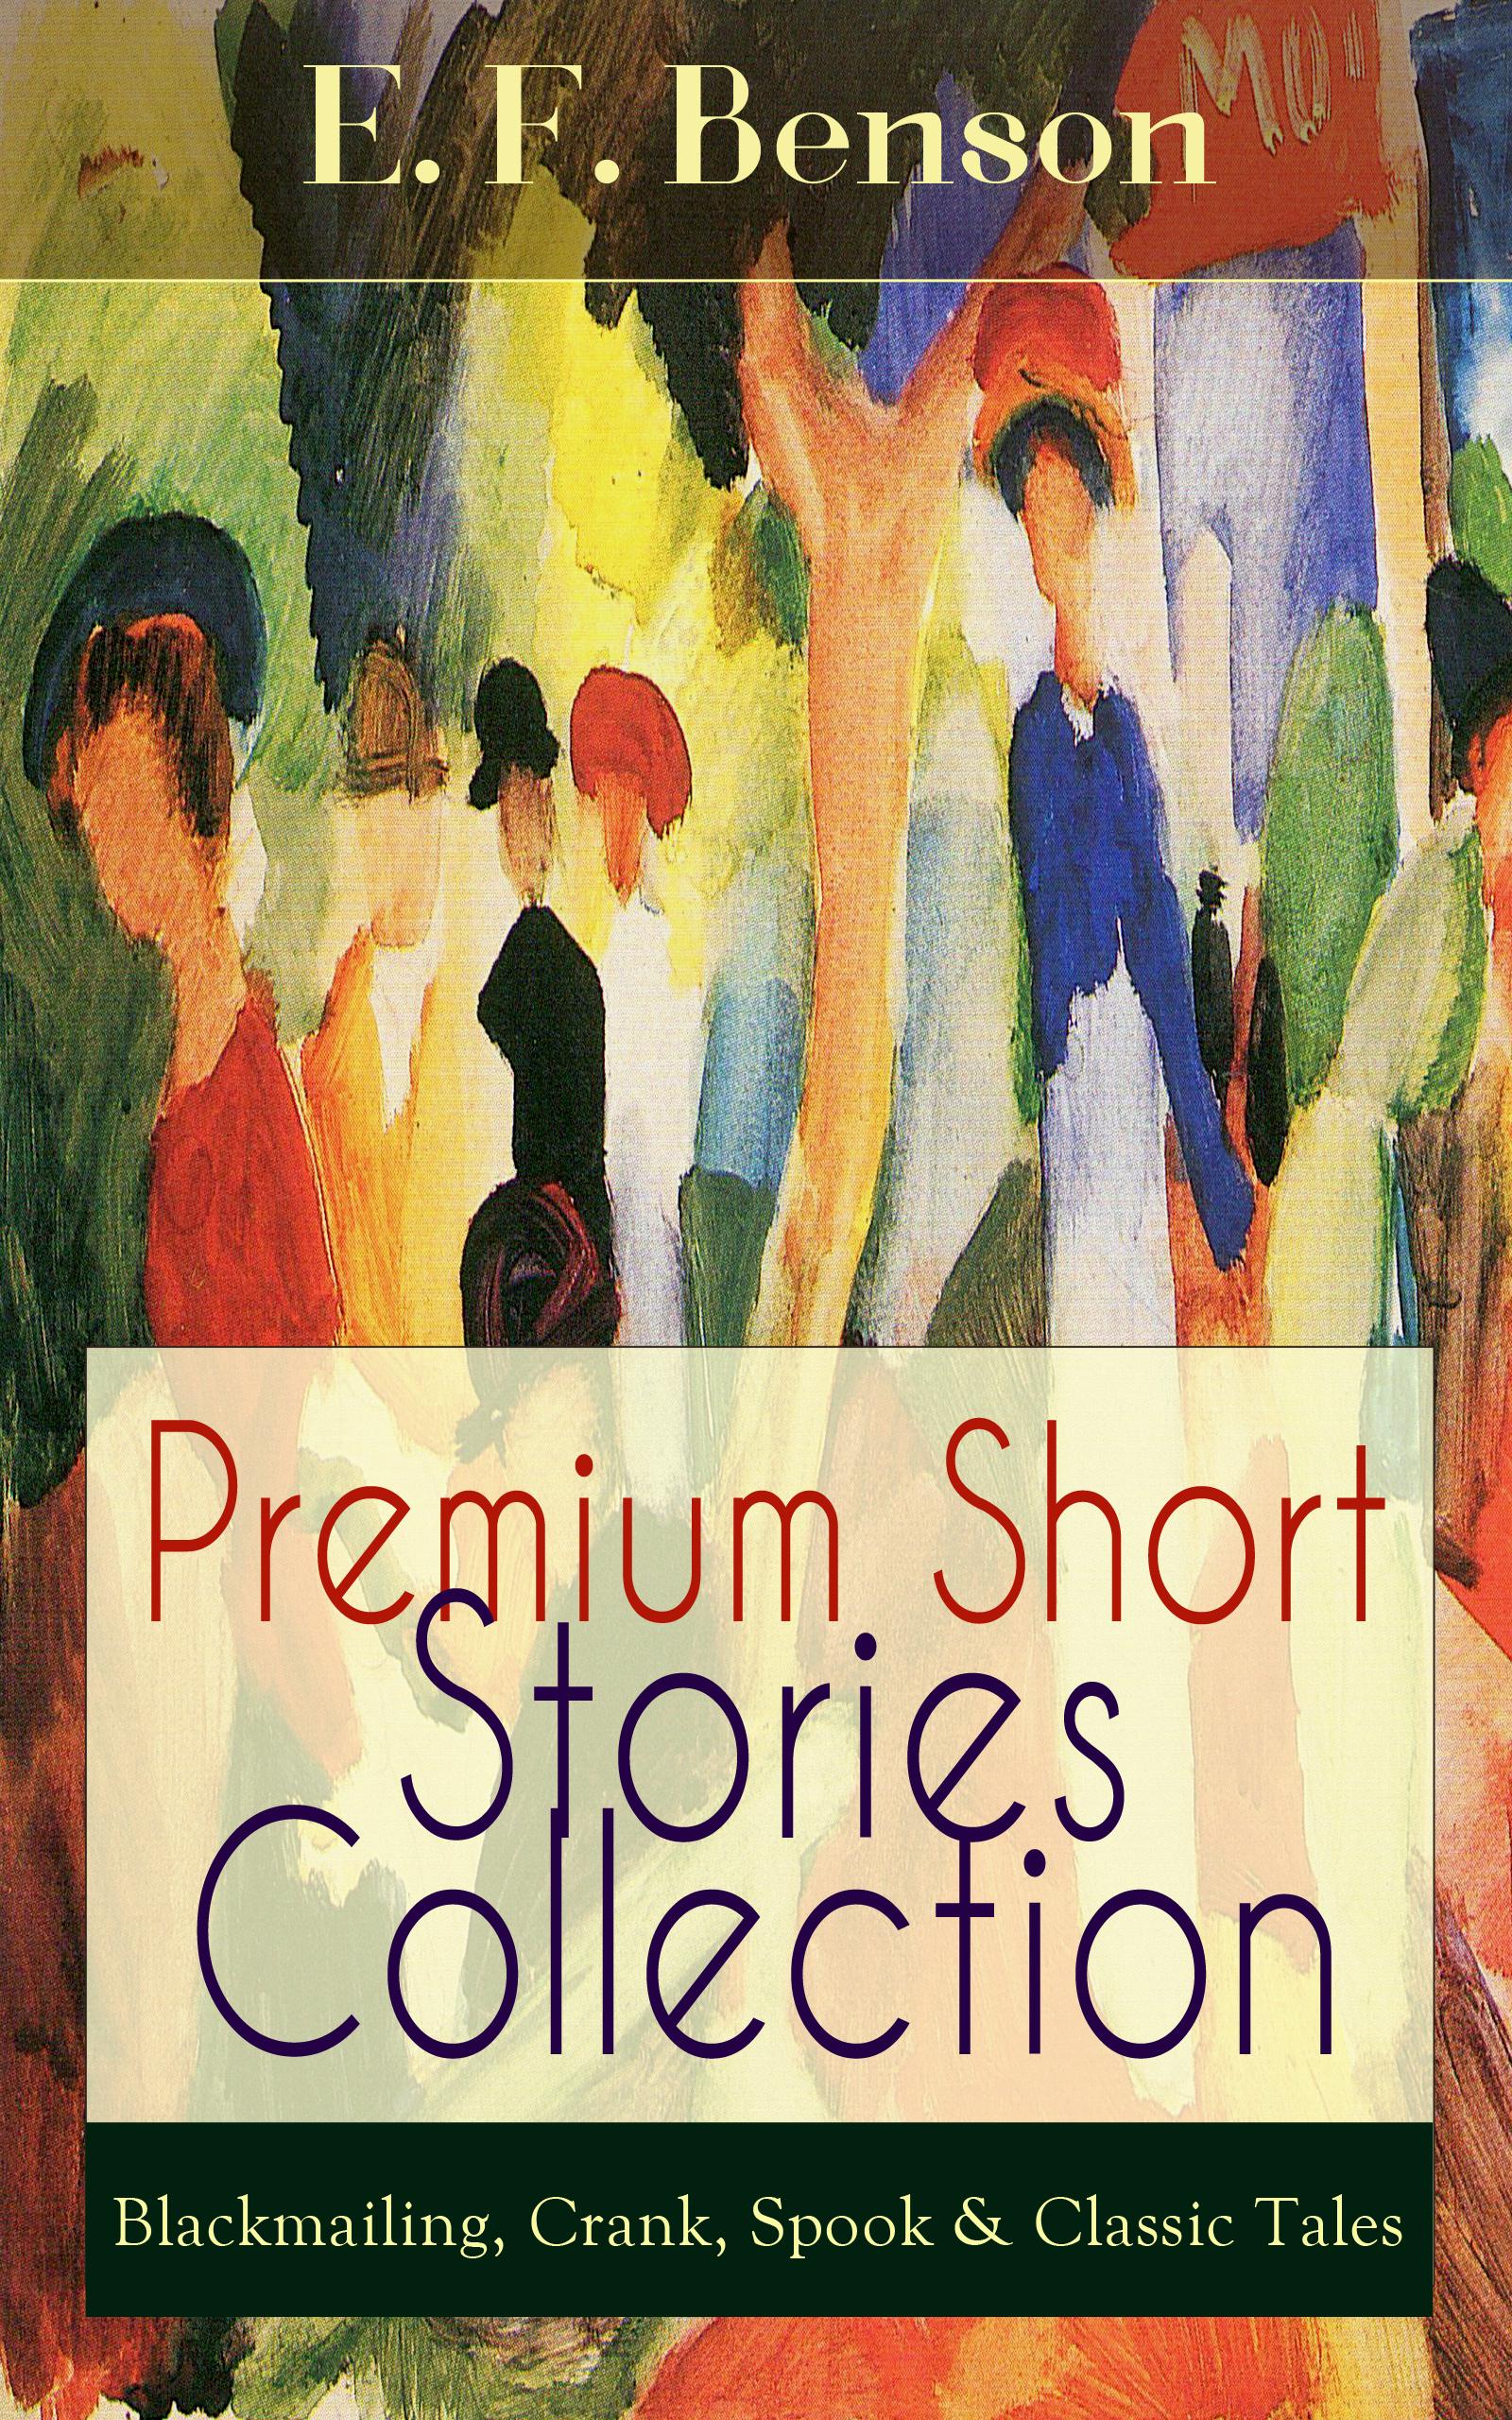 цена E. F. Benson Premium Short Stories Collection - Blackmailing, Crank, Spook & Classic Tales онлайн в 2017 году